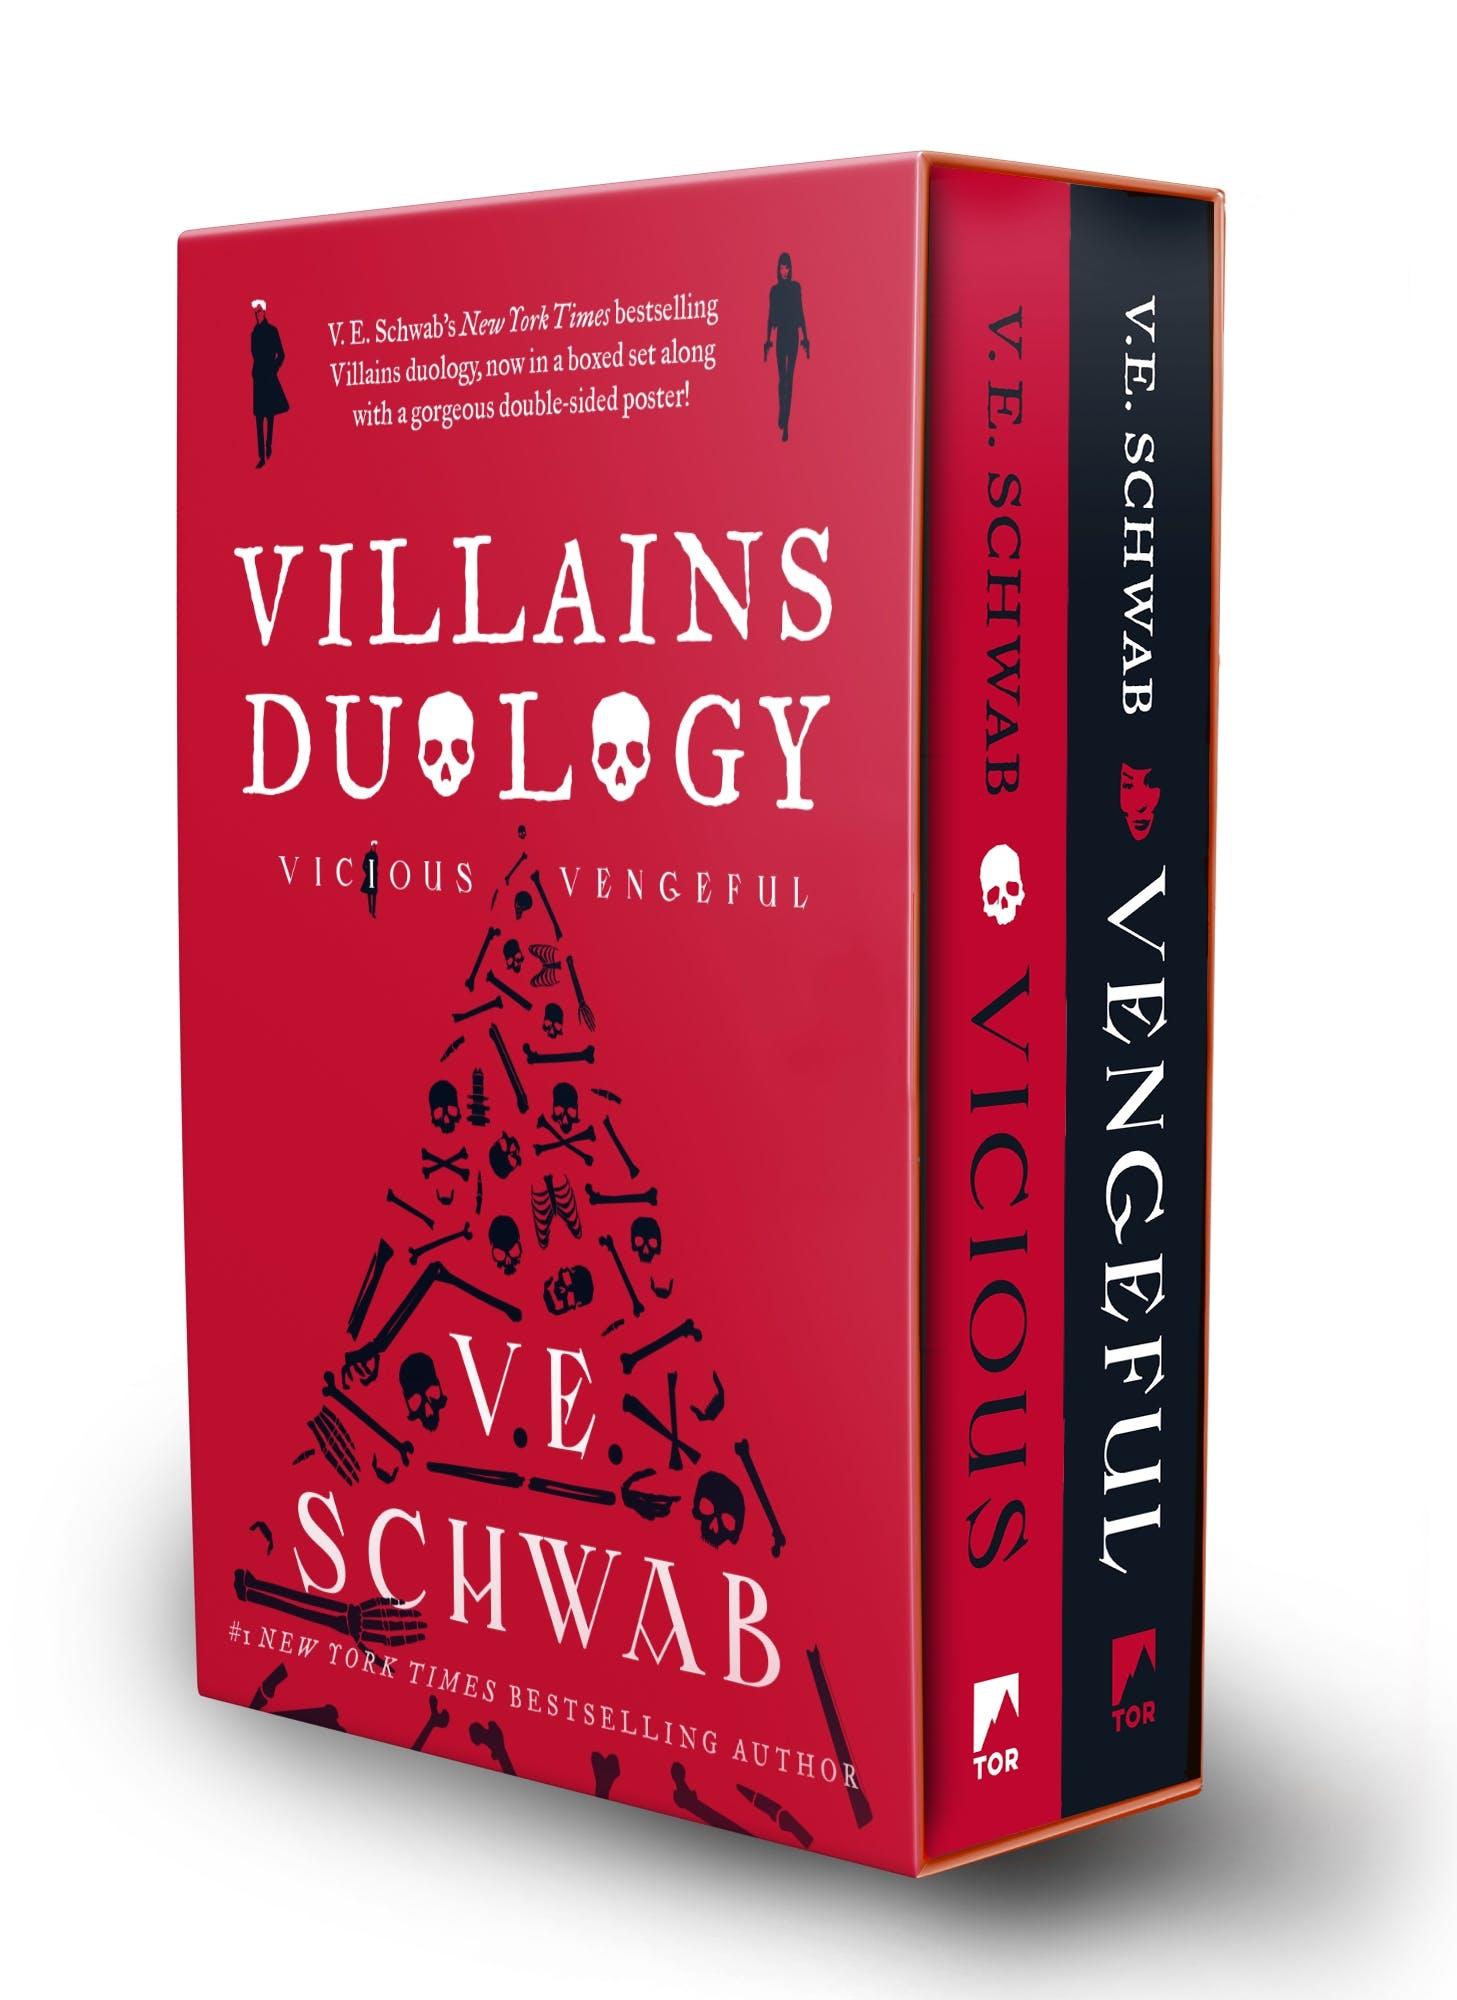 Image of Villains Duology Boxed Set